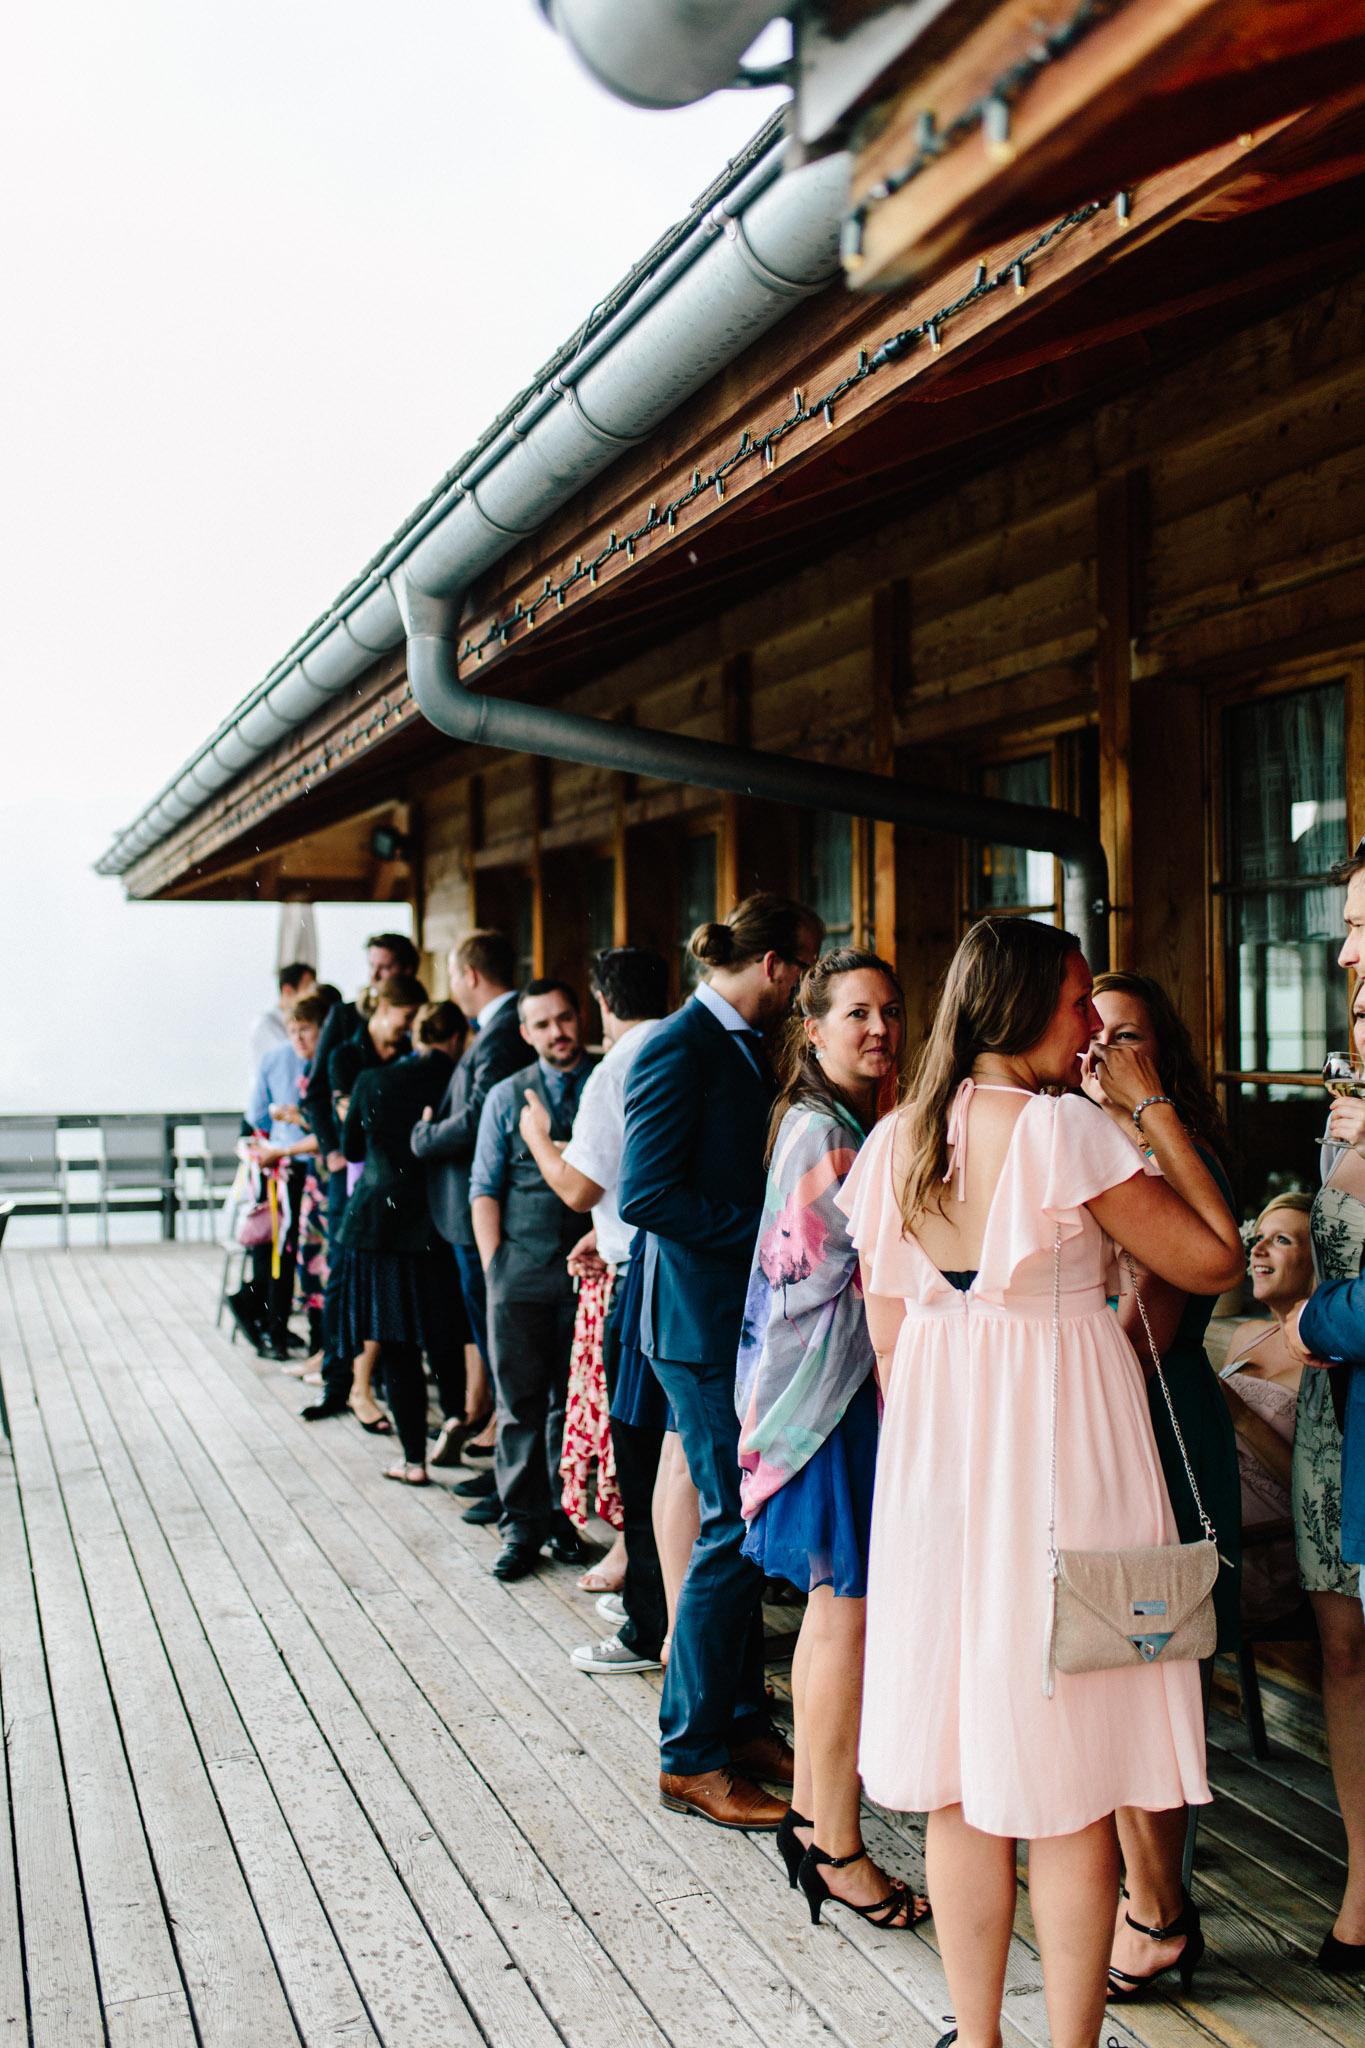 Lenl-Simmental-Buehlerhof-Pia-Anna-Christian-Wedding-Photography-EK-86.jpg